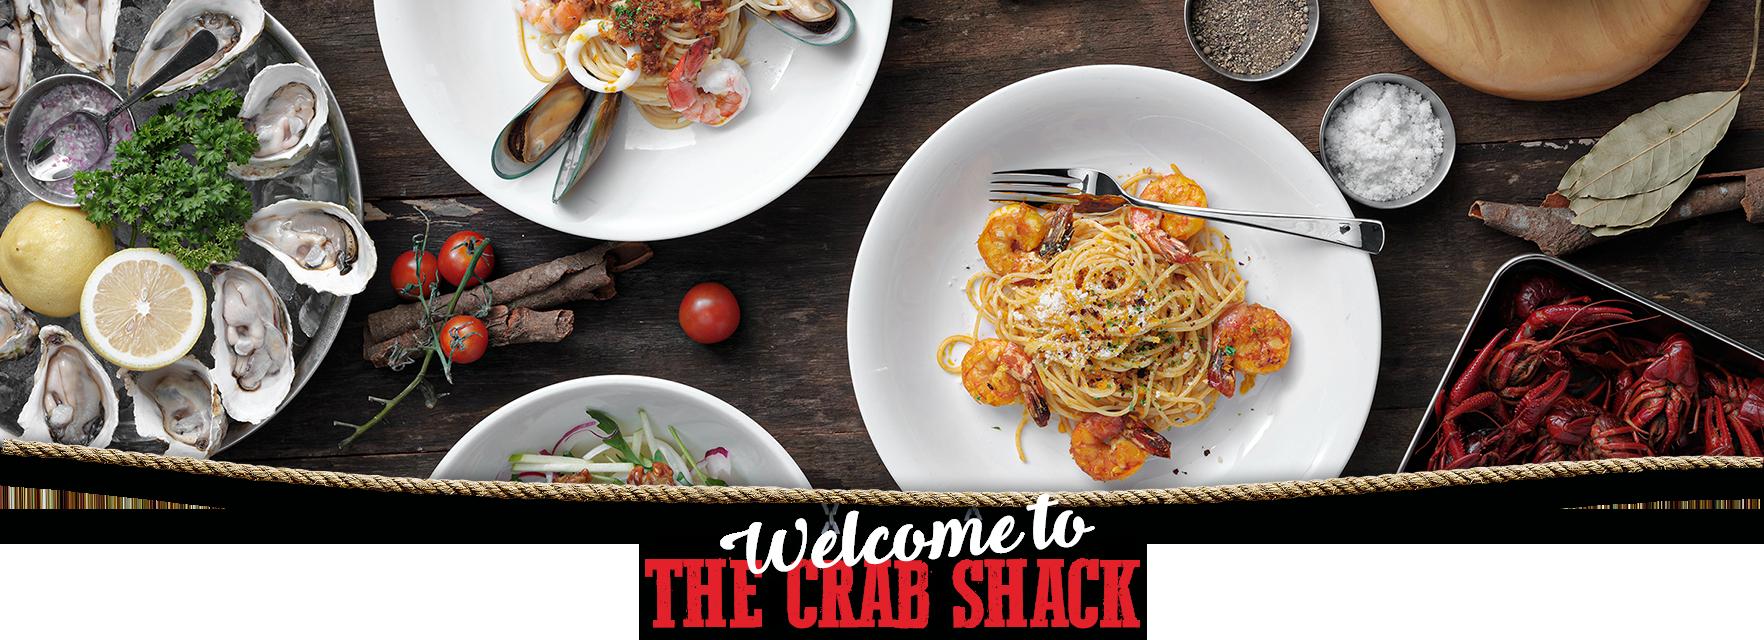 The Crab Shack | Seafood Restaurant, Ho chi minh city